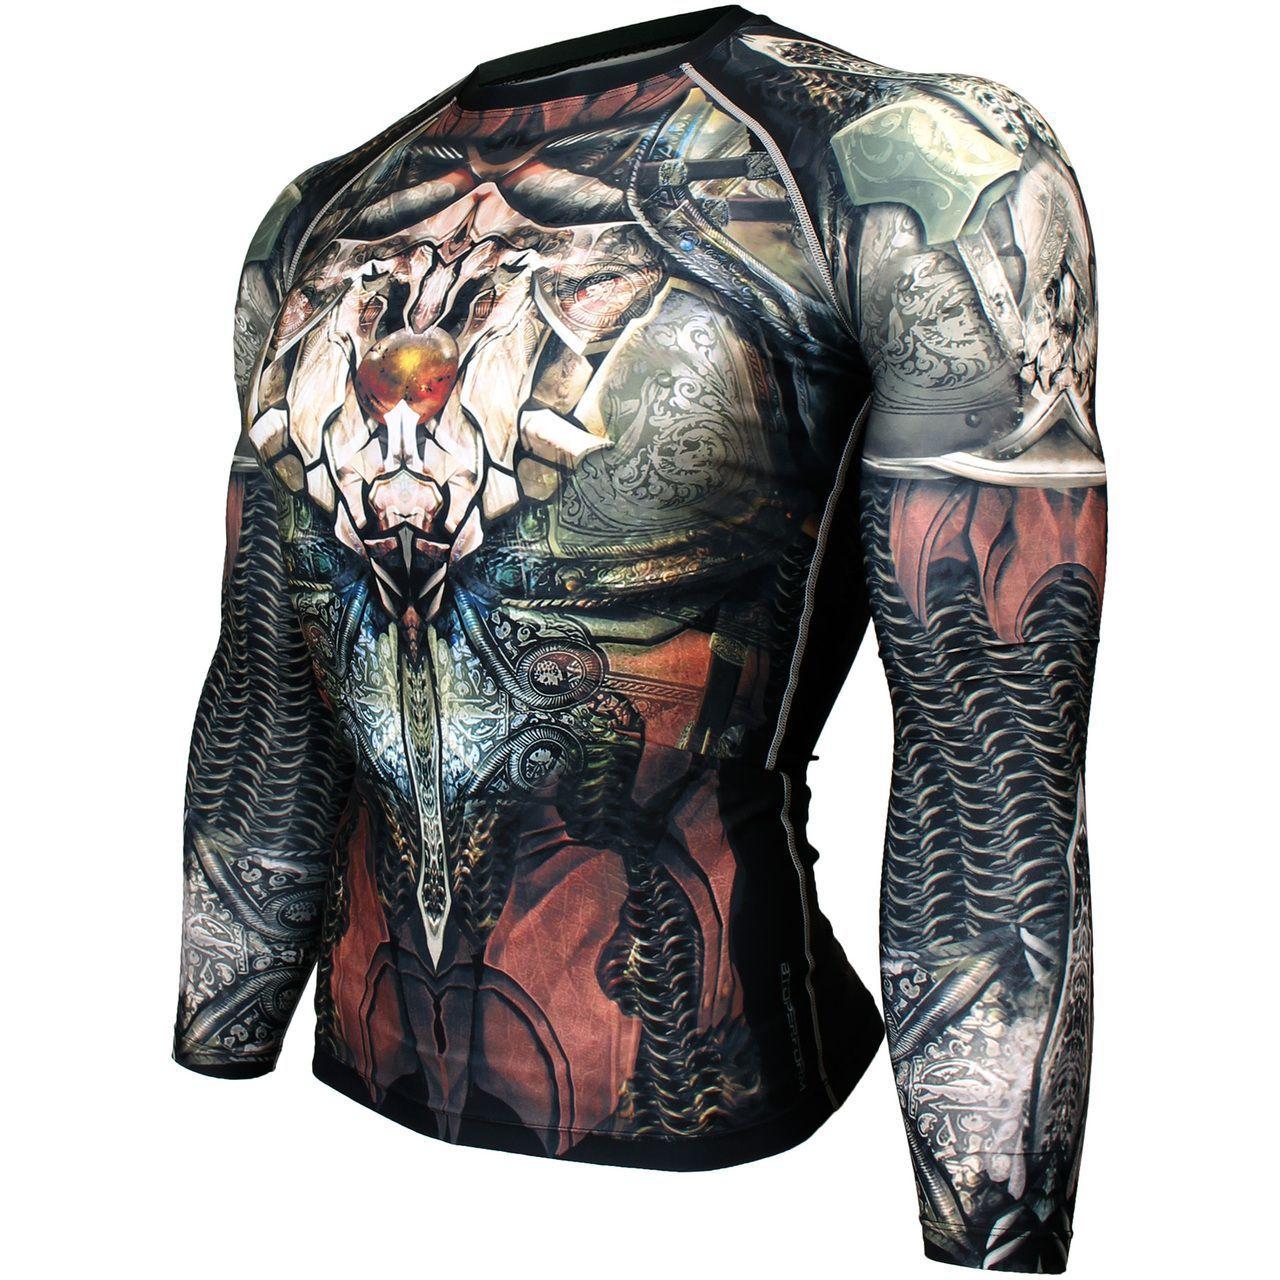 Marquesantattoos Marquesan Tattoos Long Sleeve Shirts Tattoos